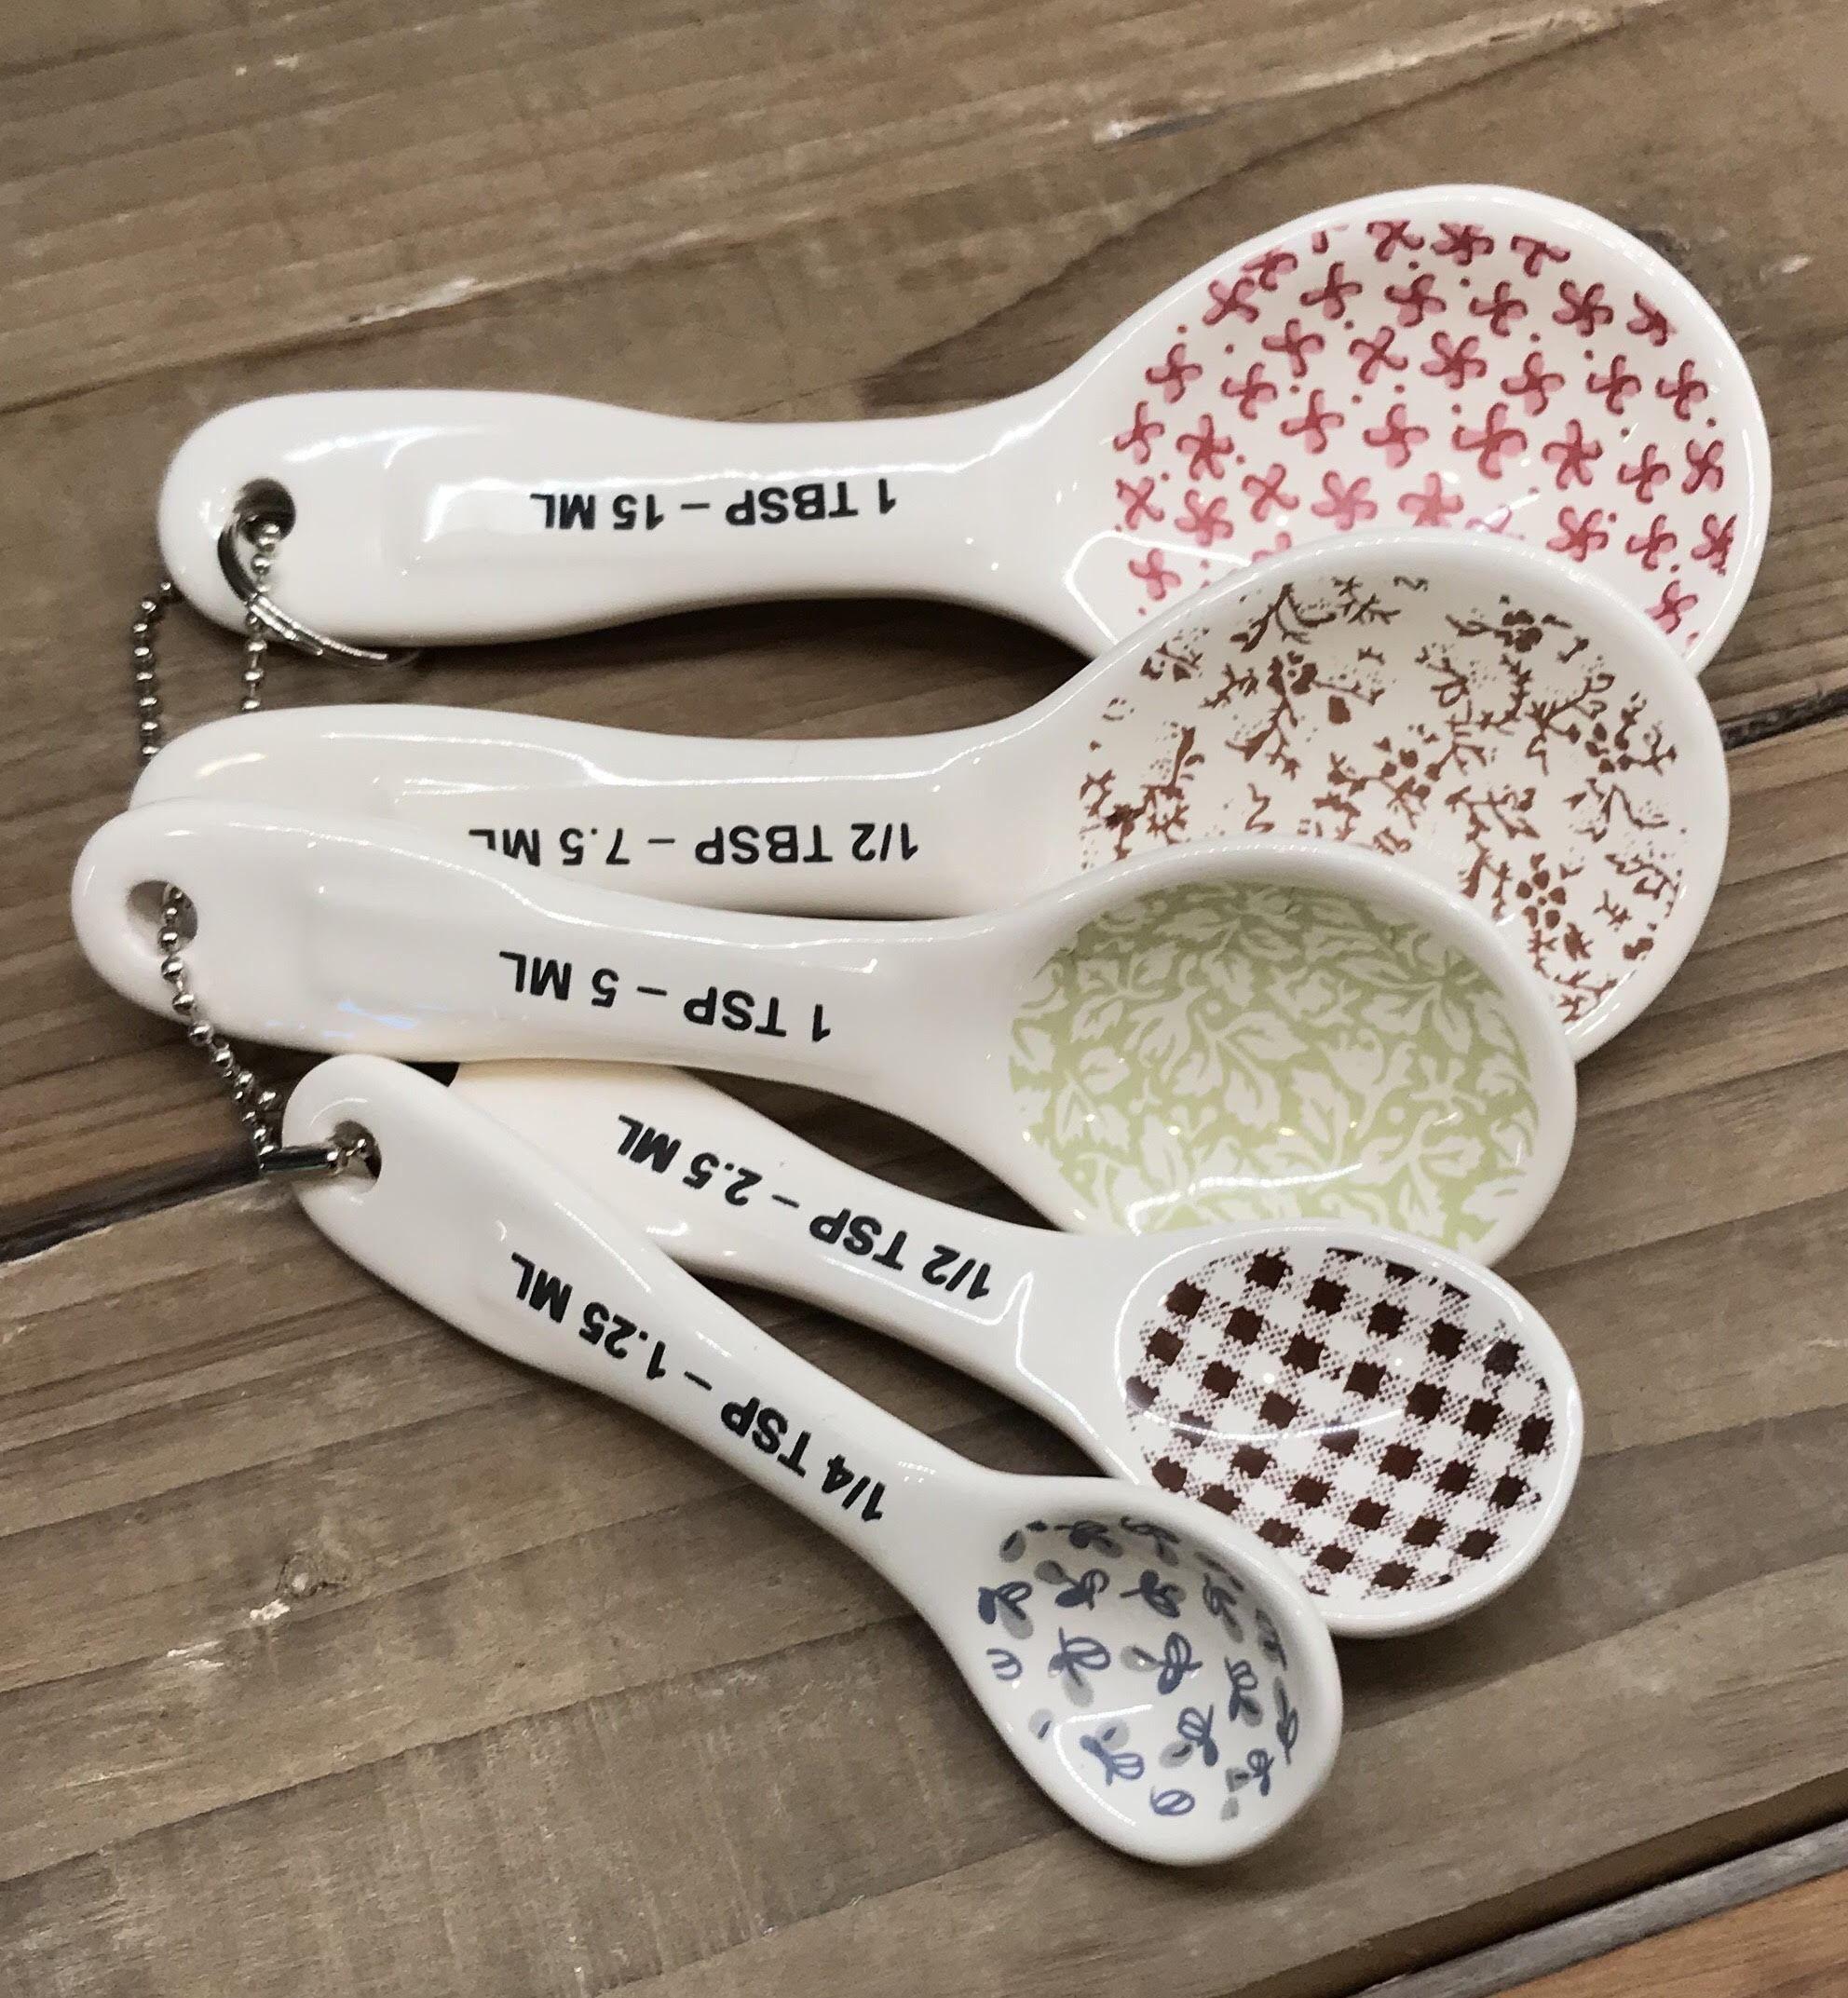 New Rae Dunn Measuring Spoons, Set of 5 Rae dunn